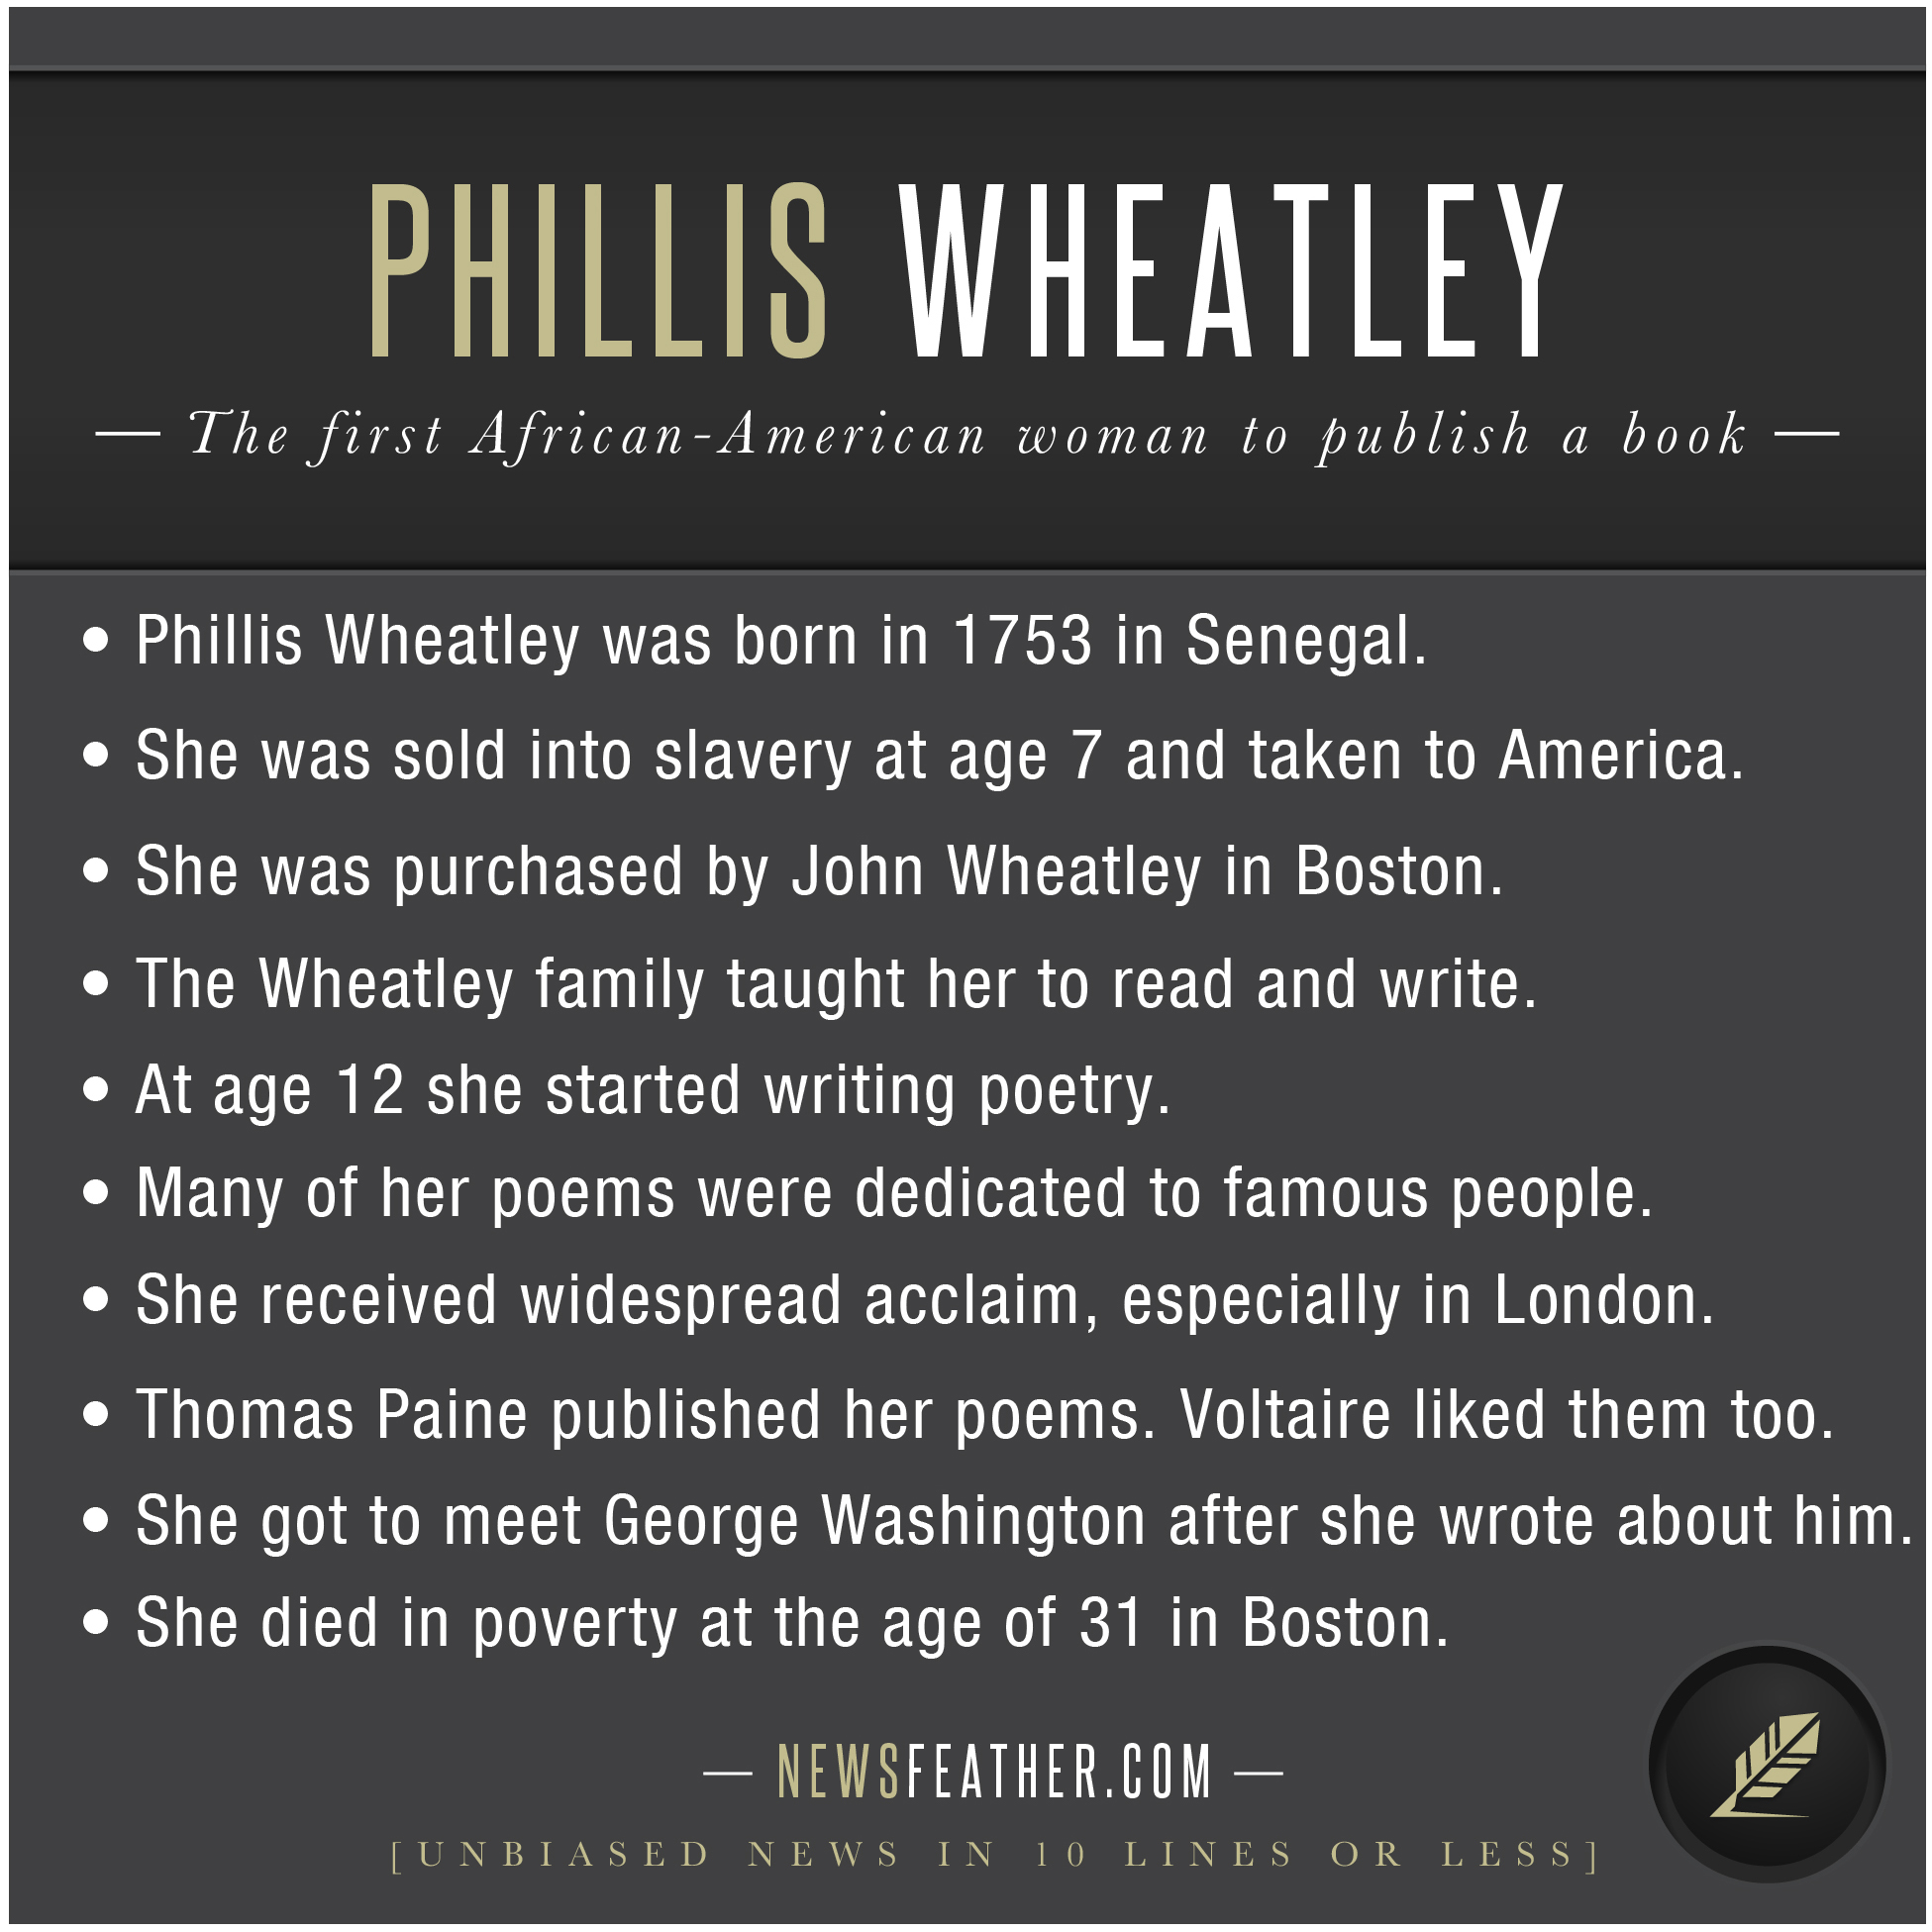 phillis wheatley life story